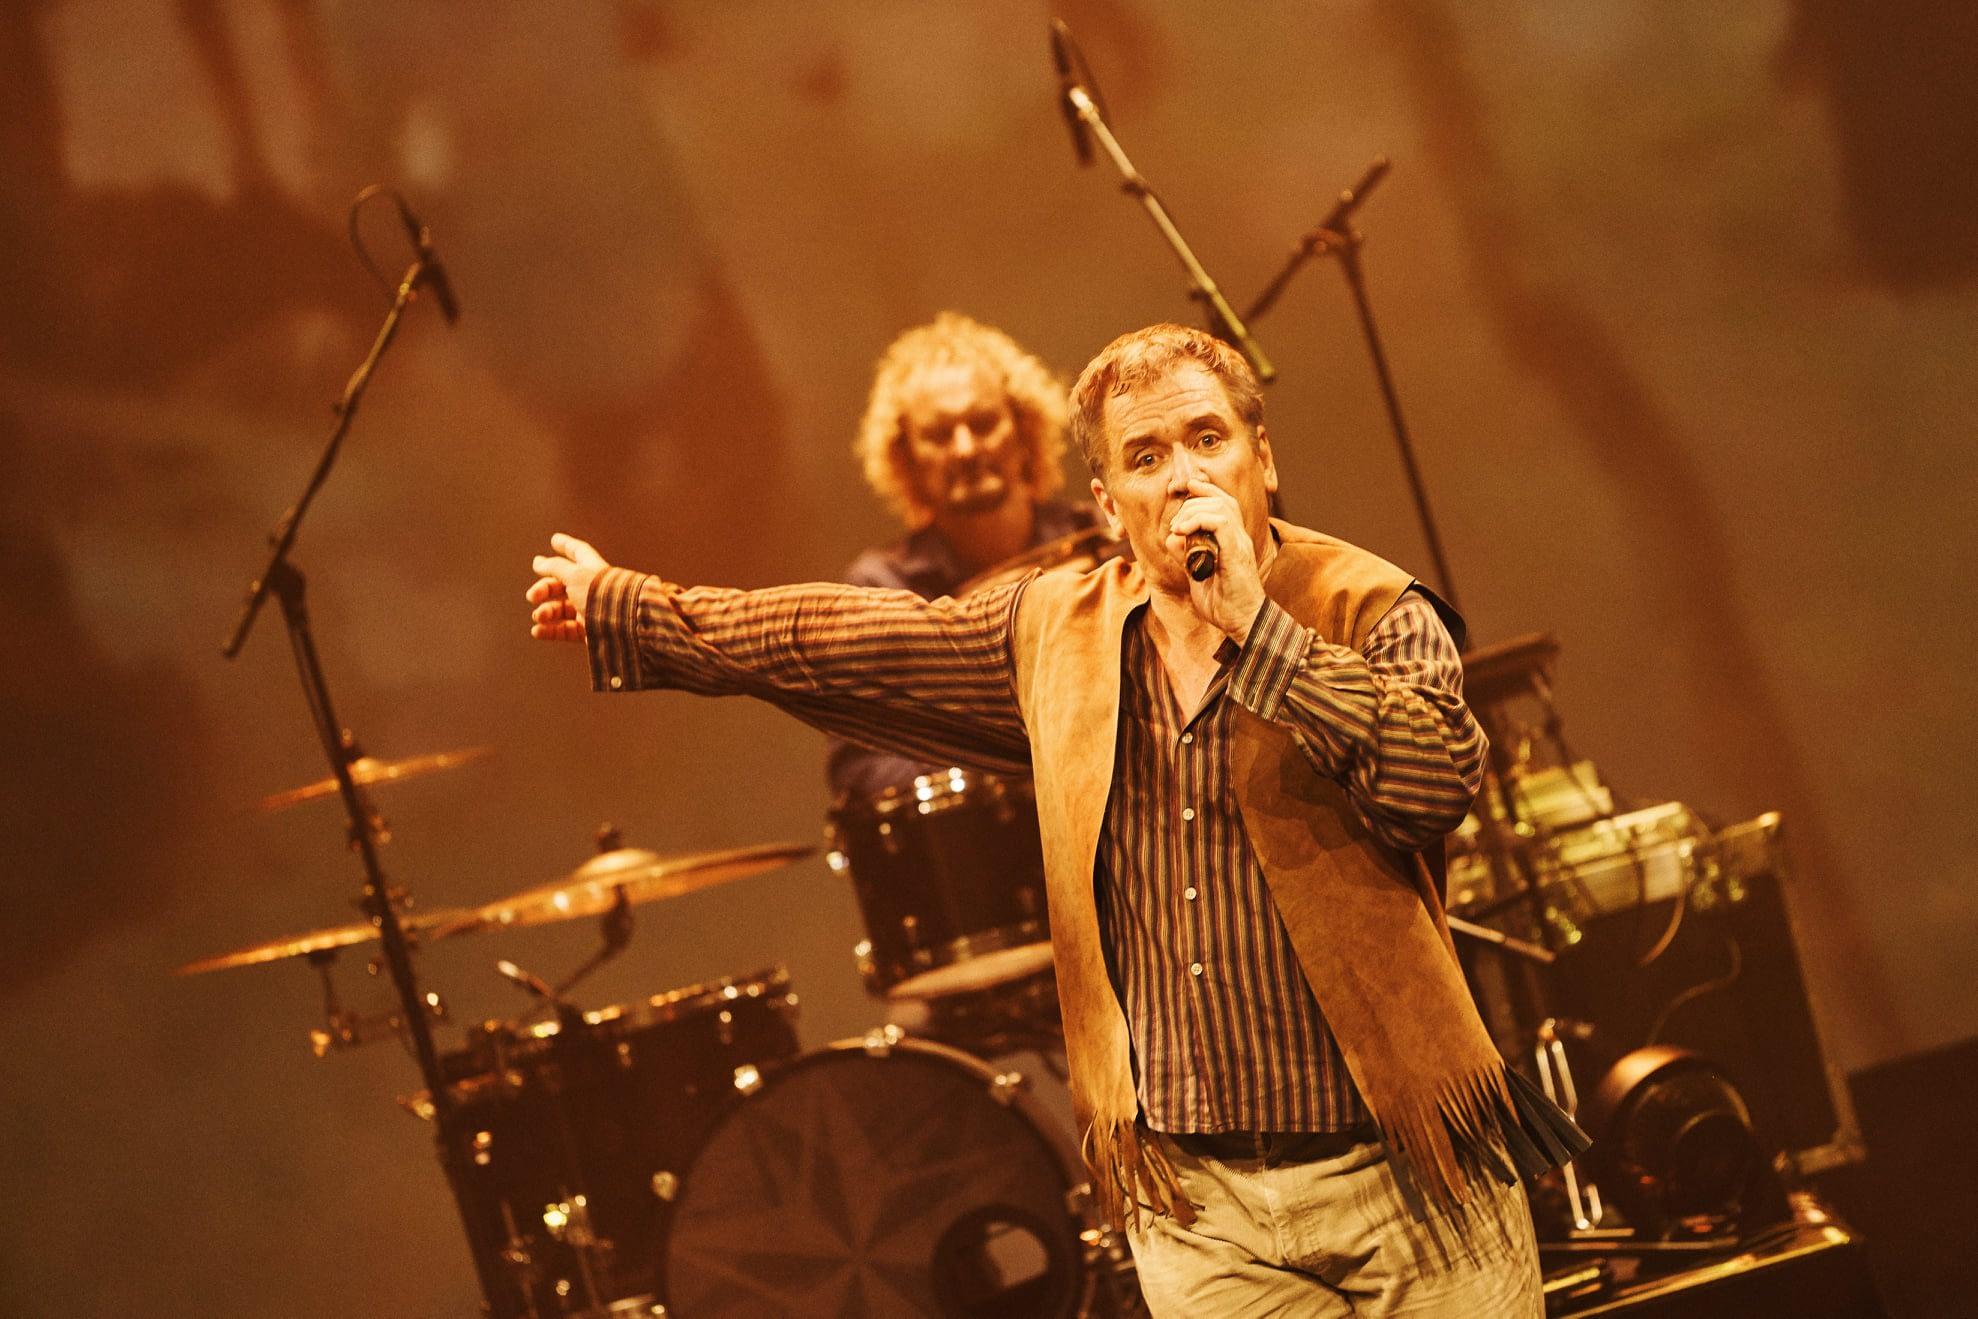 Chris in Good Morning Vietnam Live in Concert